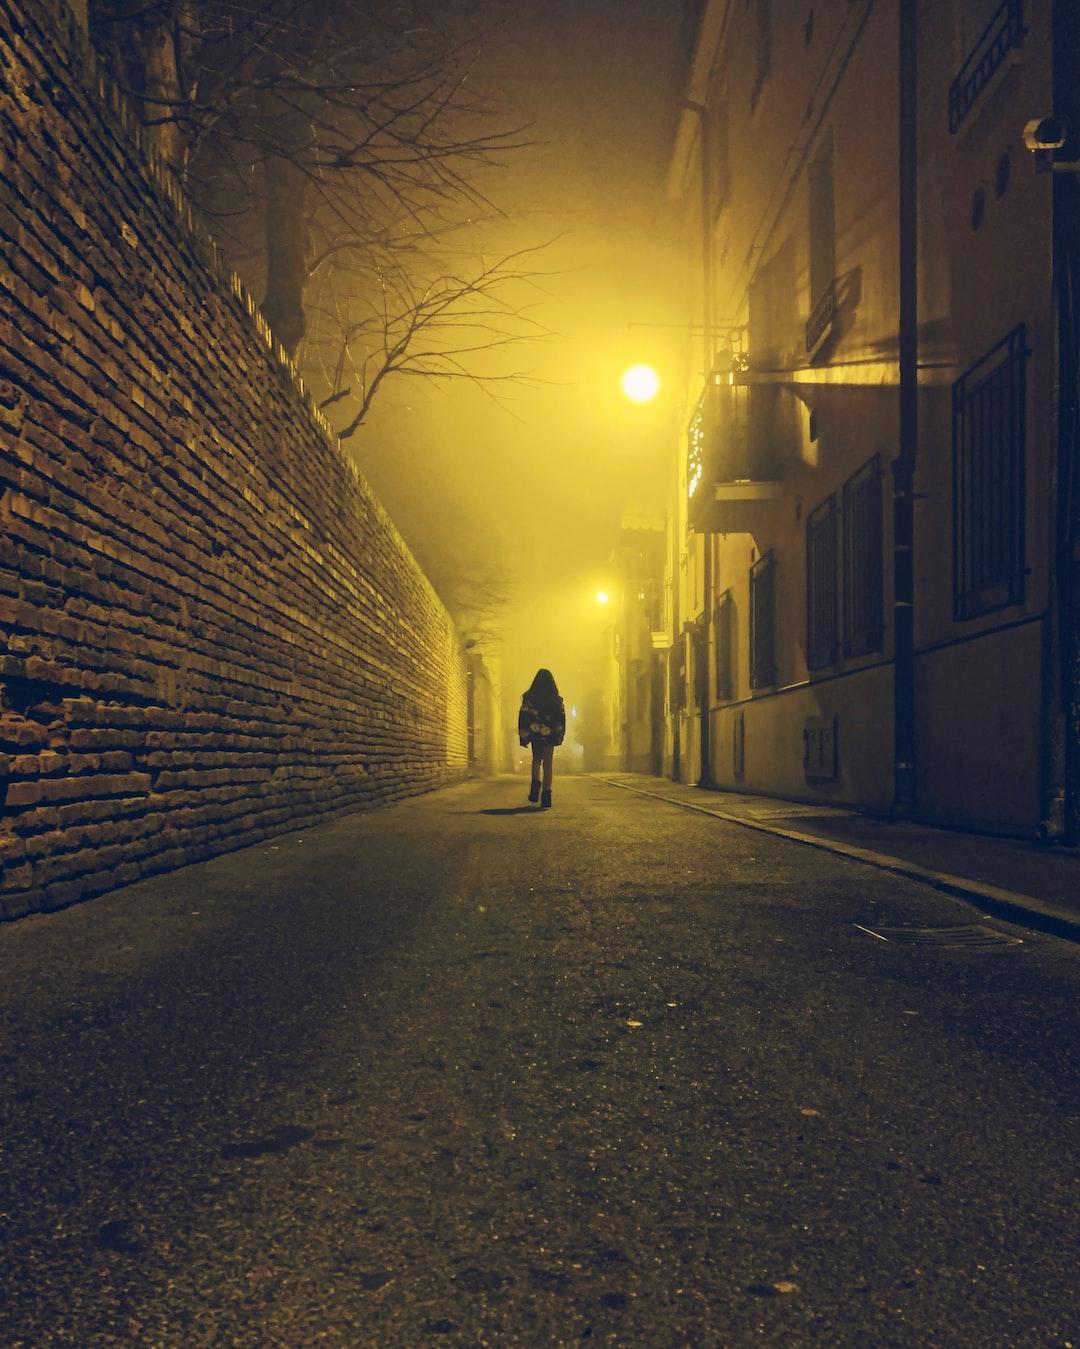 Foggy empty nighty lonely